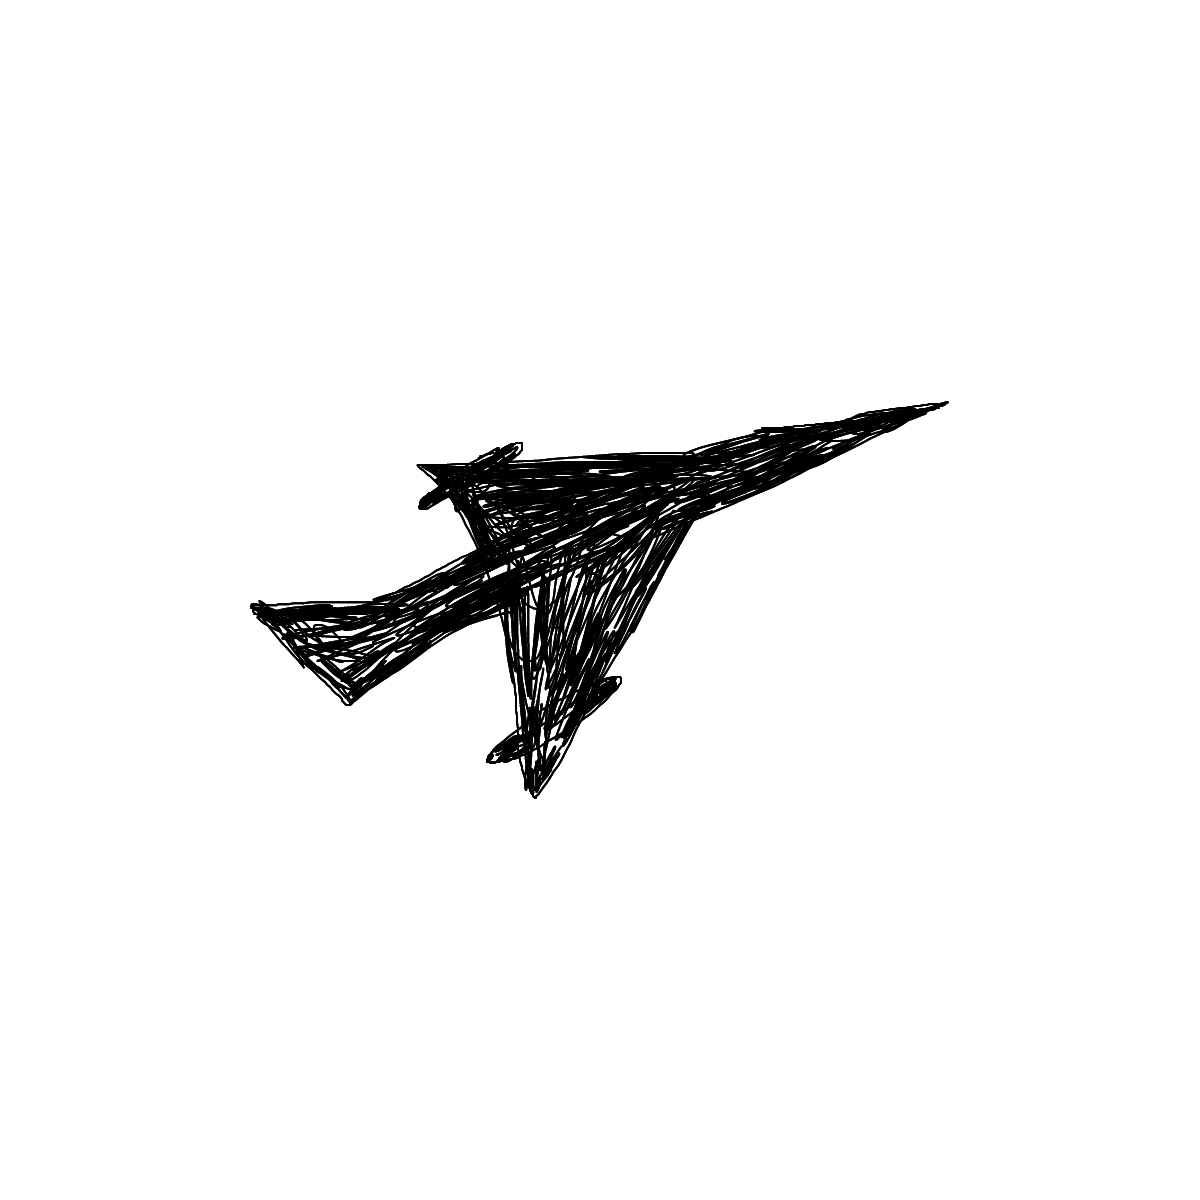 BAAAM drawing#23 lat:52.4751663208007800lng: 13.4067640304565430